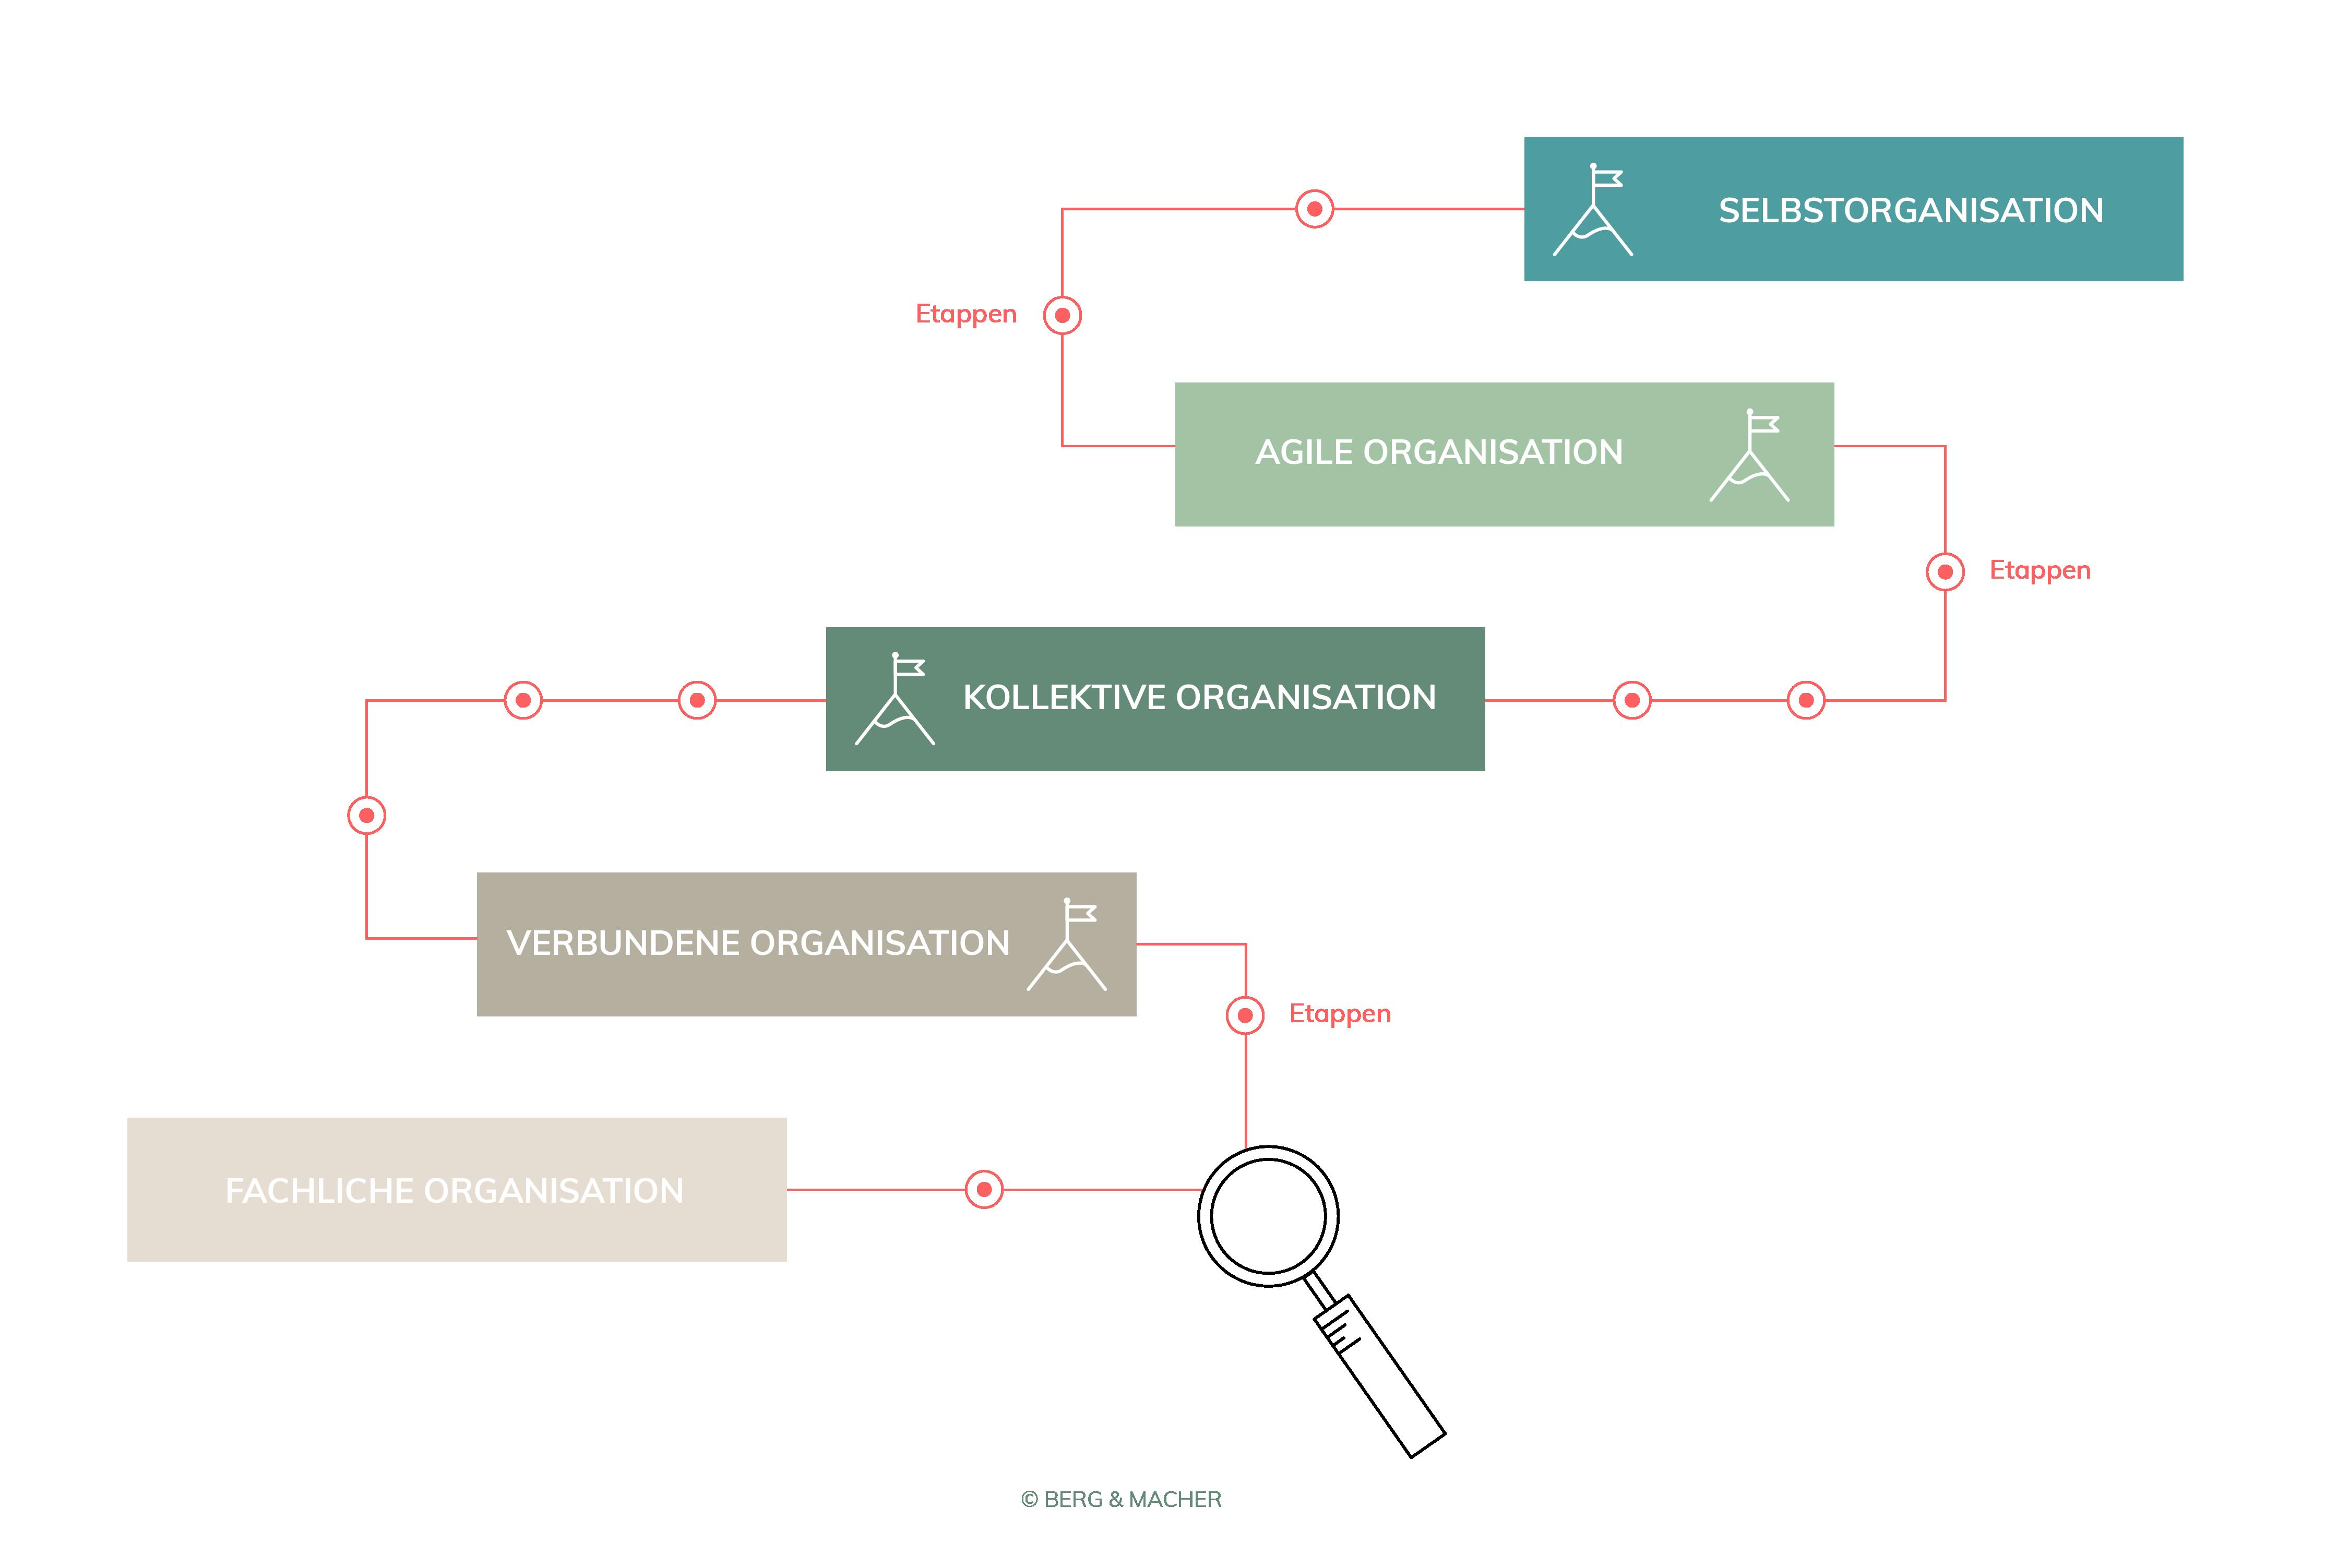 Berg-Macher-Teamentwicklung-Organisations_stufen_Modell